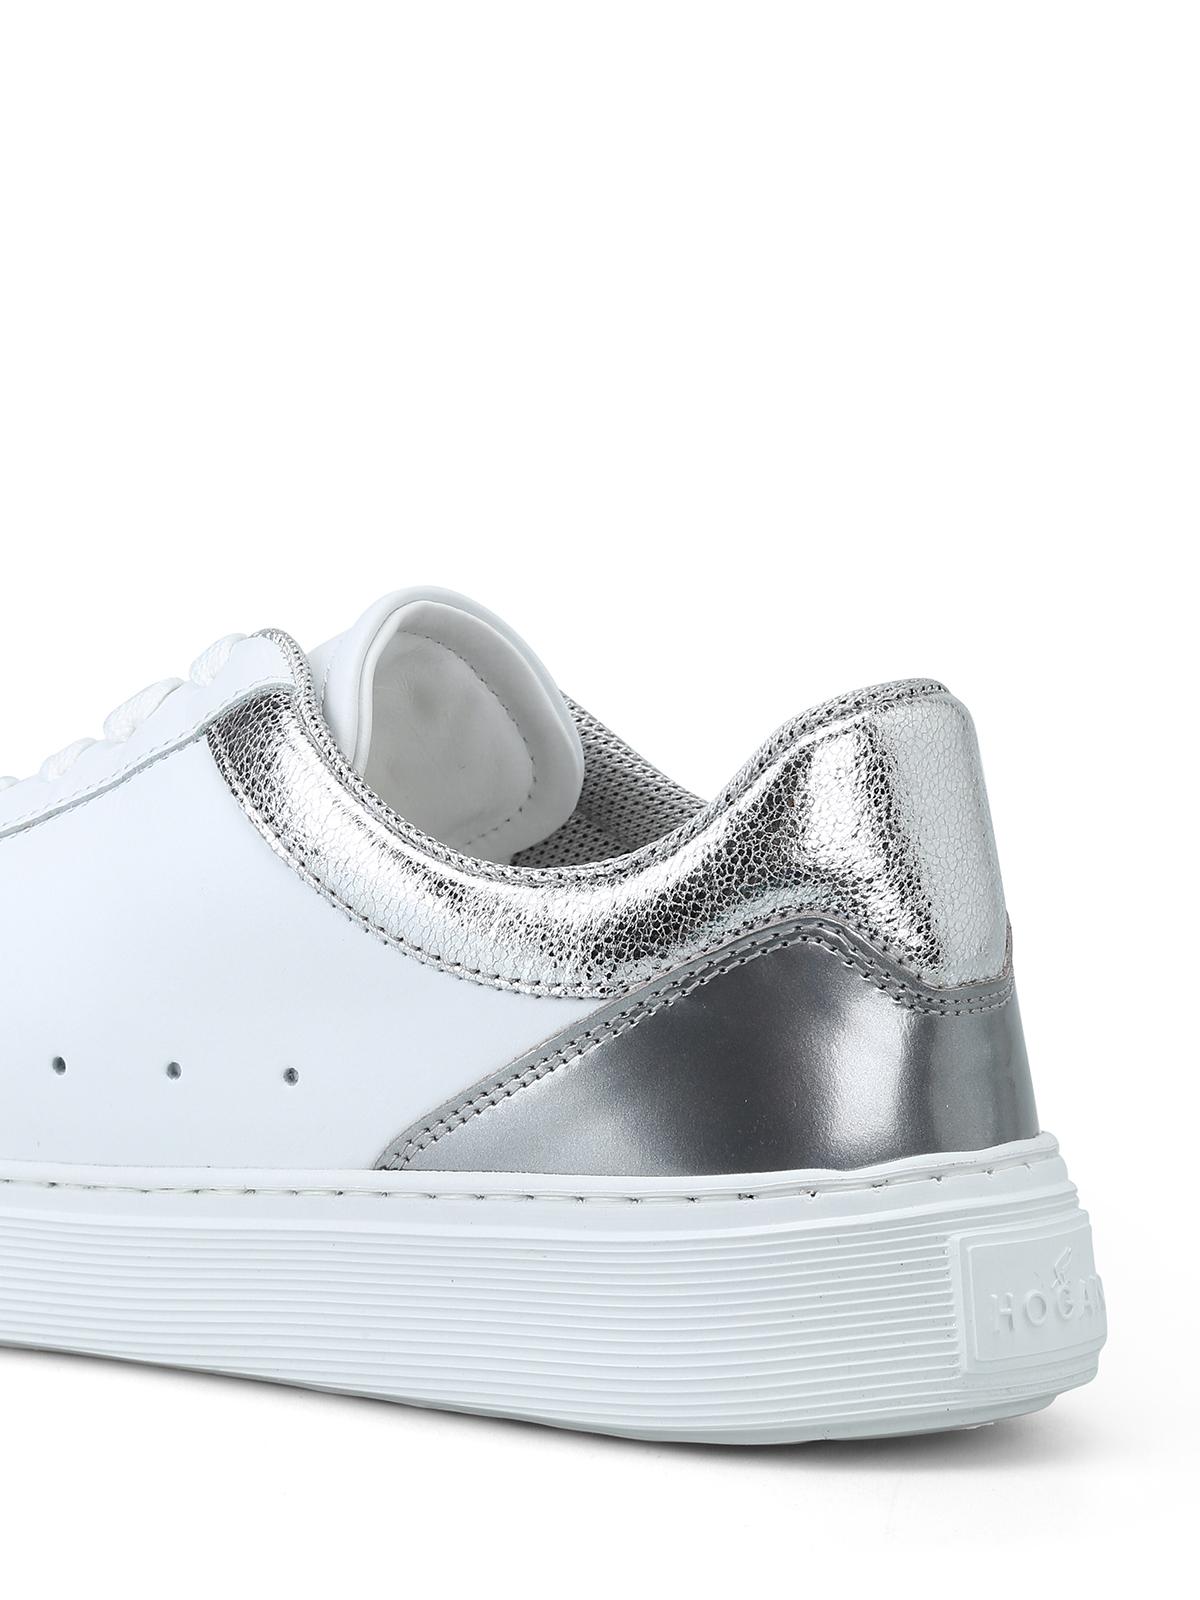 Sneakers Hogan - Sneaker H365 bianche e argento - HXW3650J971JCU0351